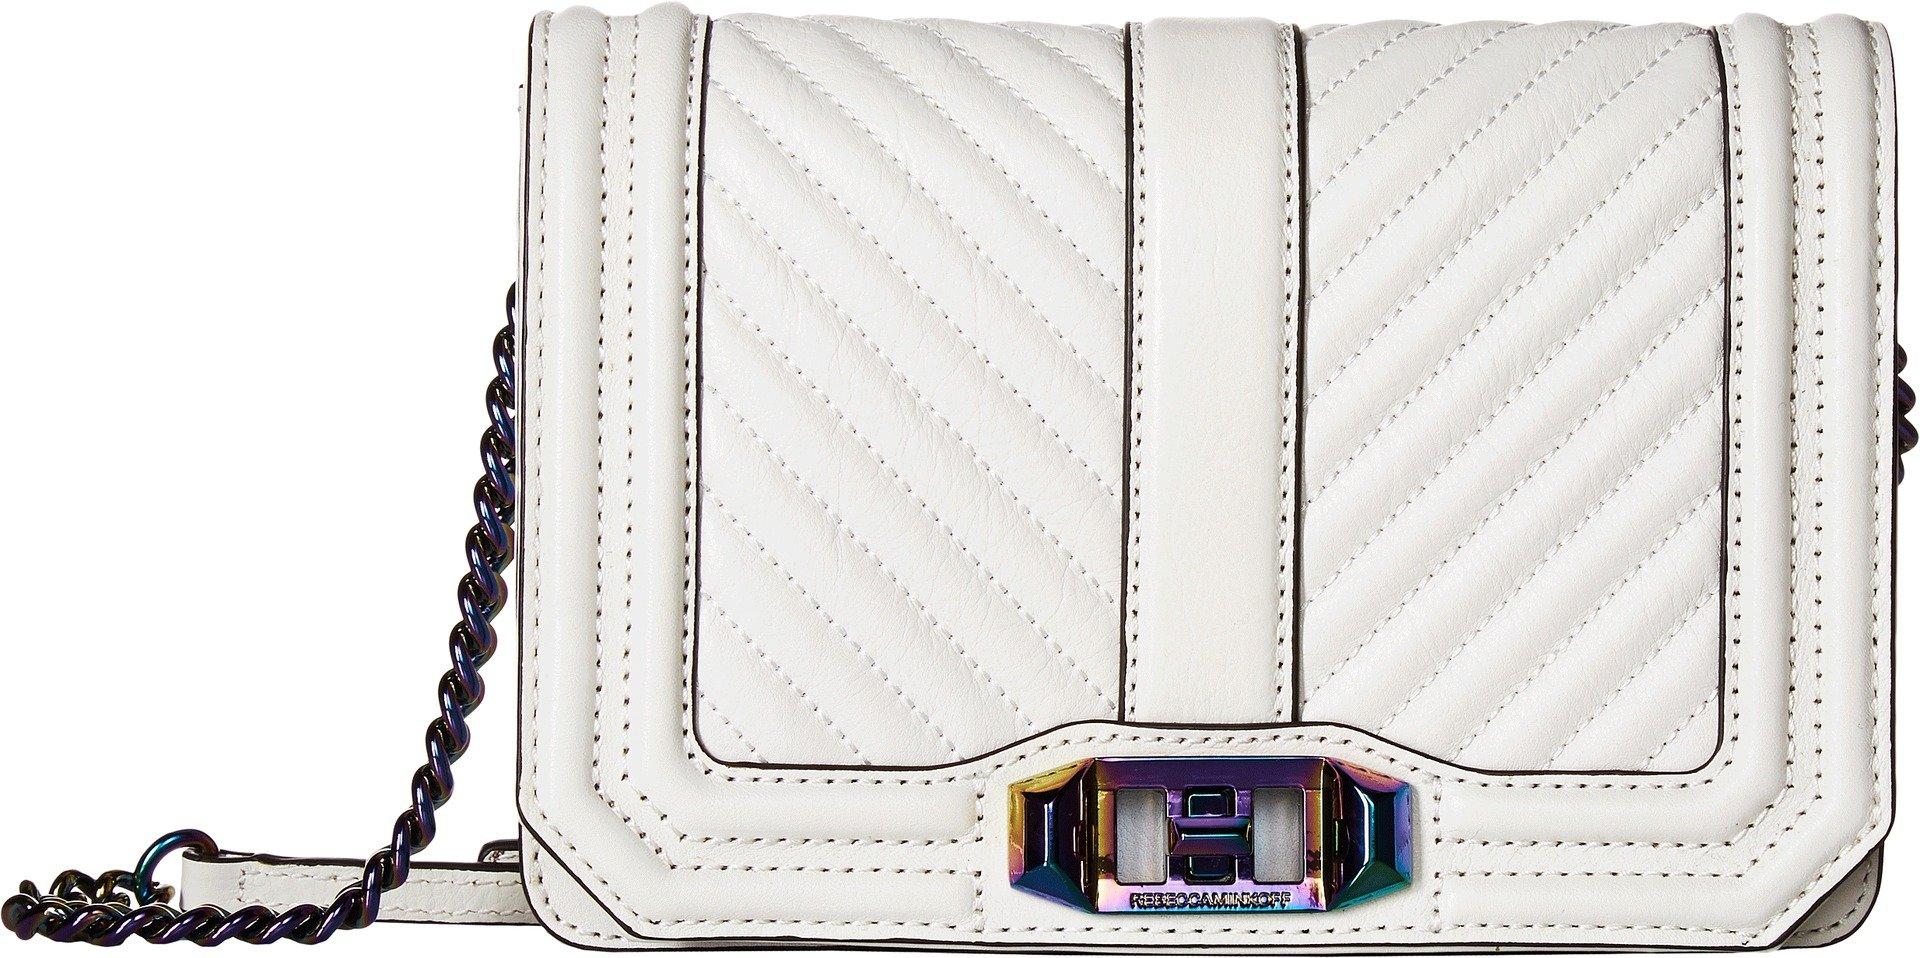 Rebecca Minkoff Women's Chevron Small Quilted Love Cross Body Bag, Bianco, One Size